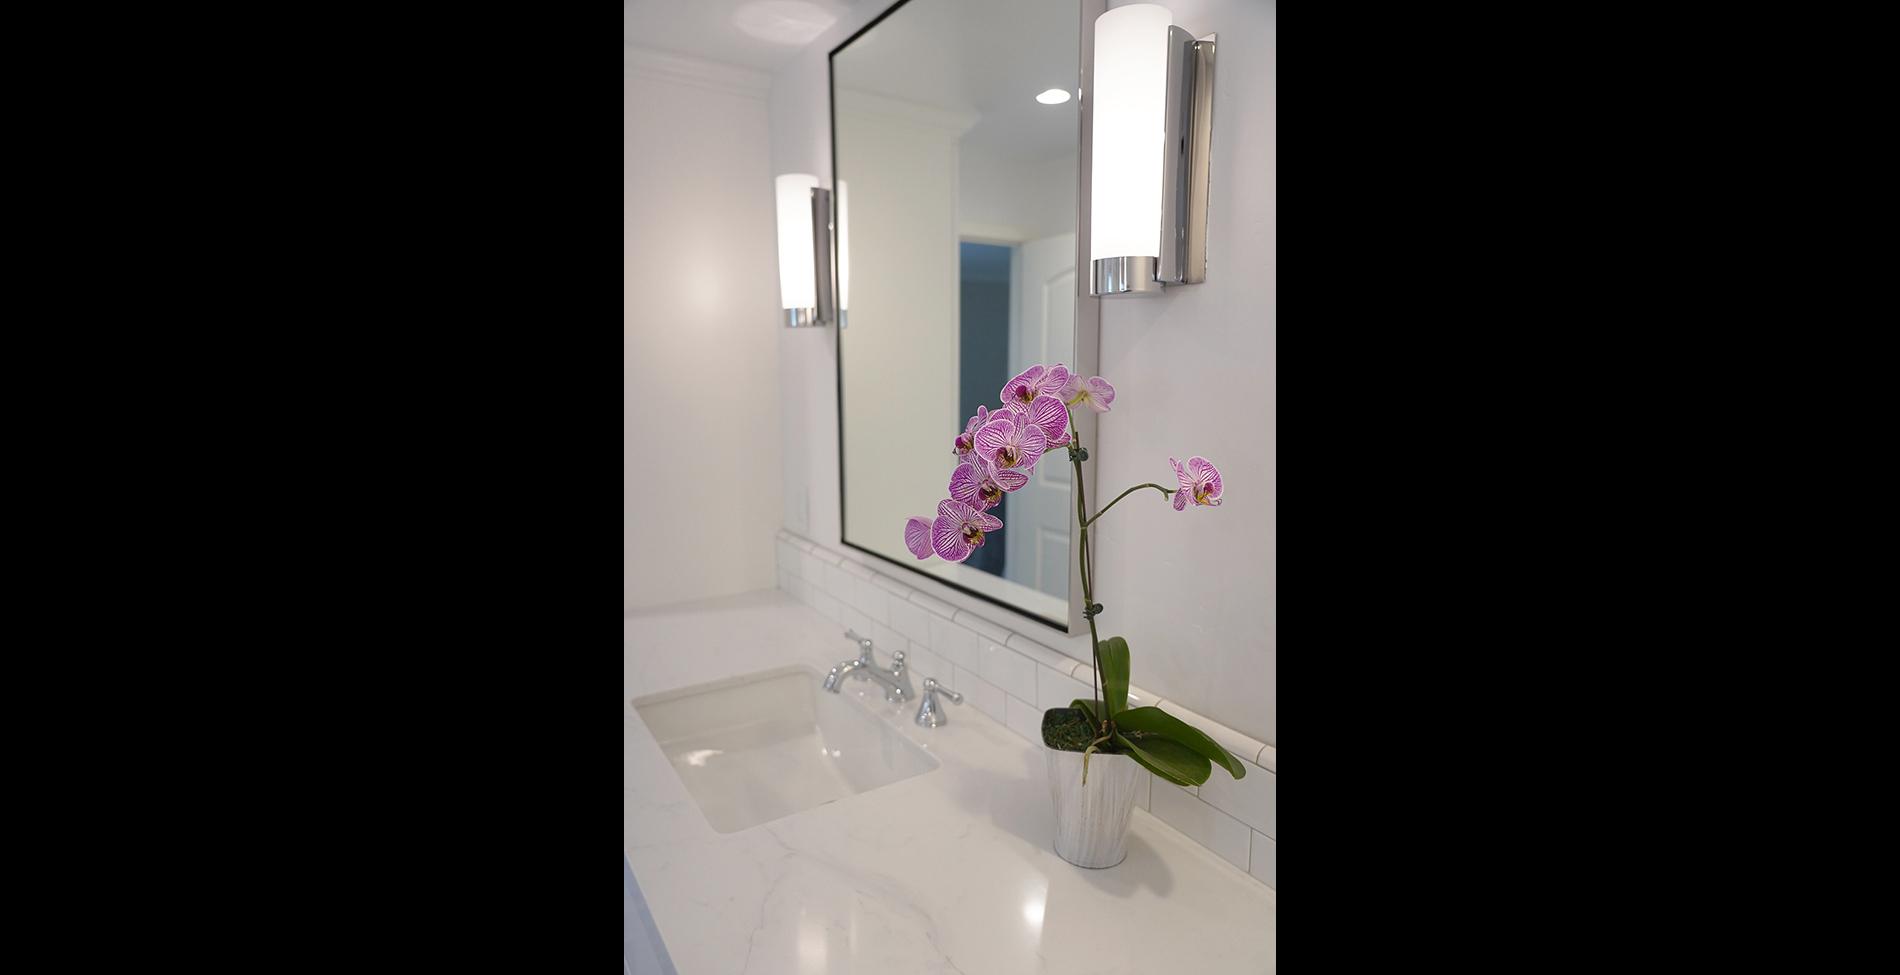 ADA Bathroom Grunow Construction - Featured Image